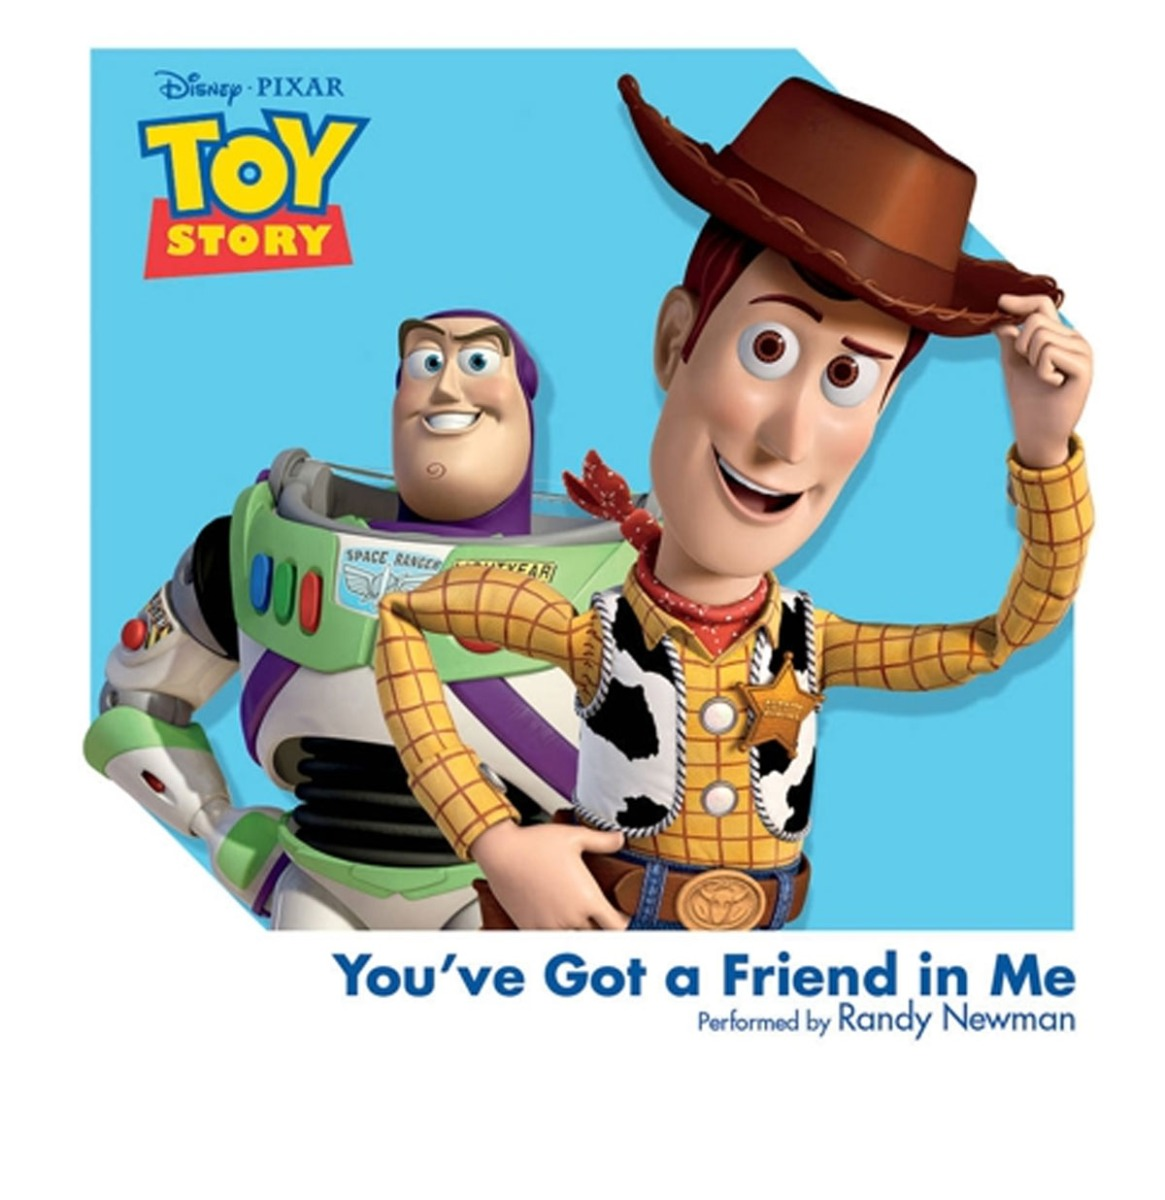 Disney's Toy Story 3 Inch Mini Single - You've Got a Friend in Me